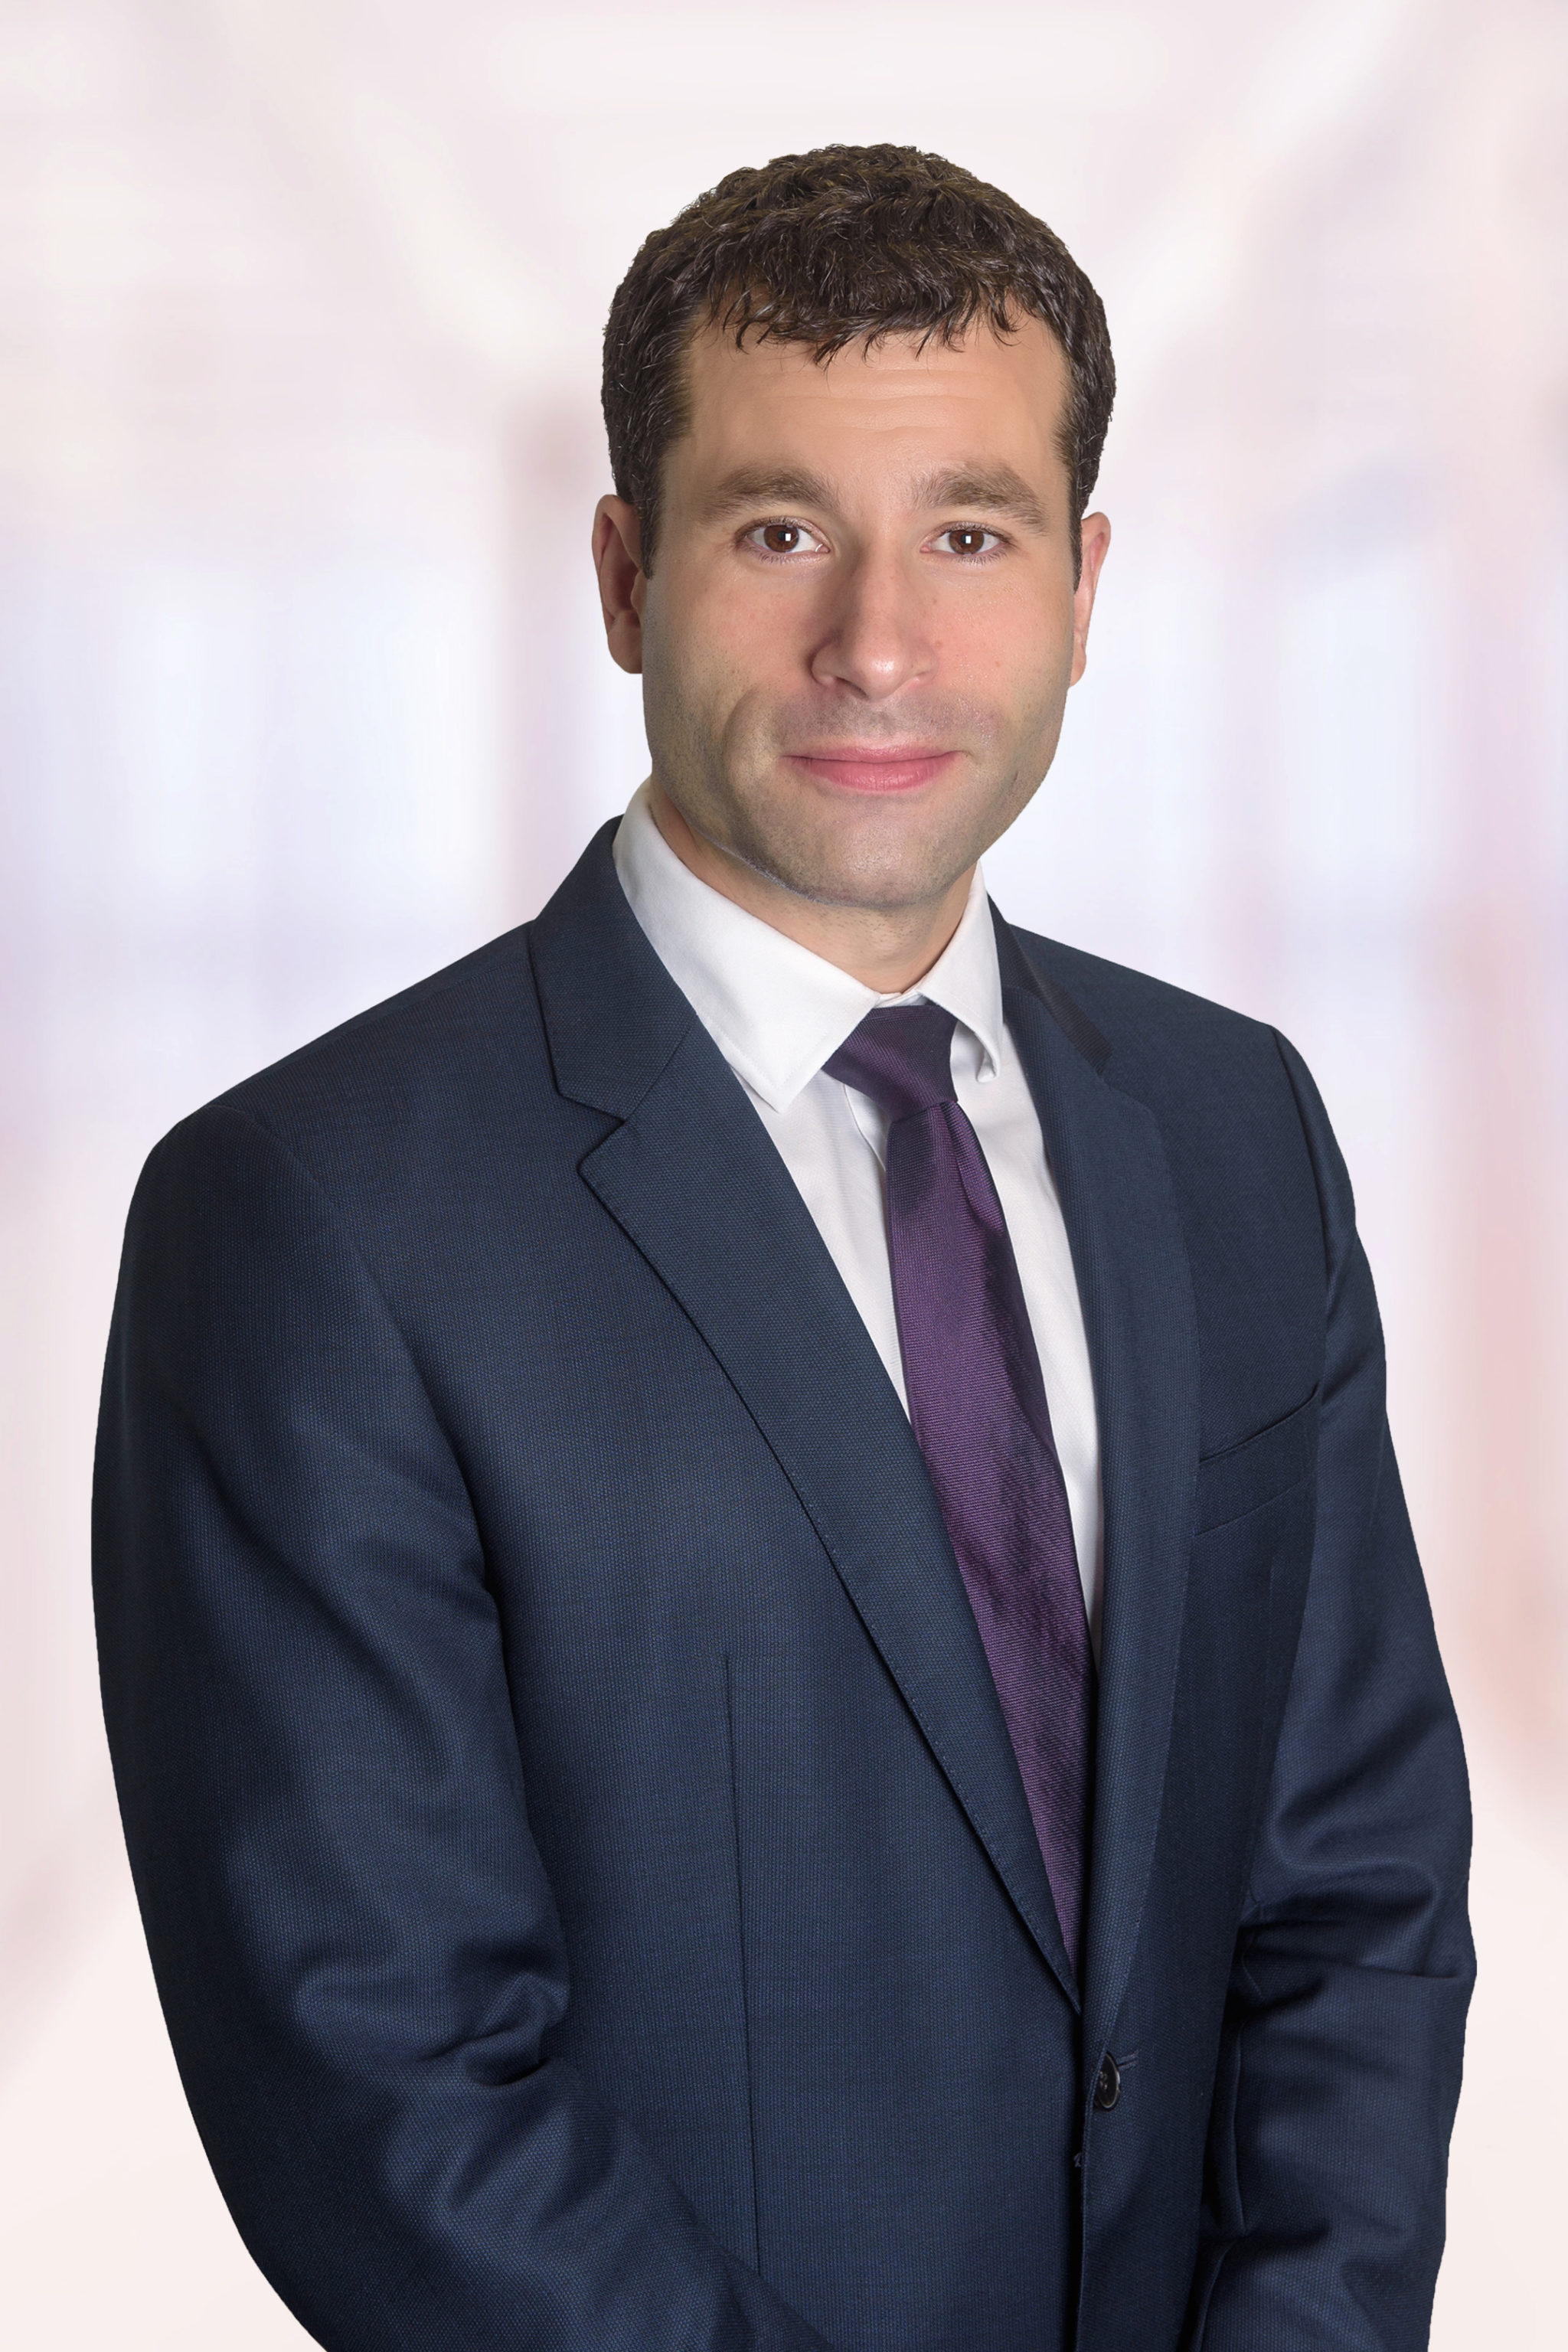 Marc A. Isaacs